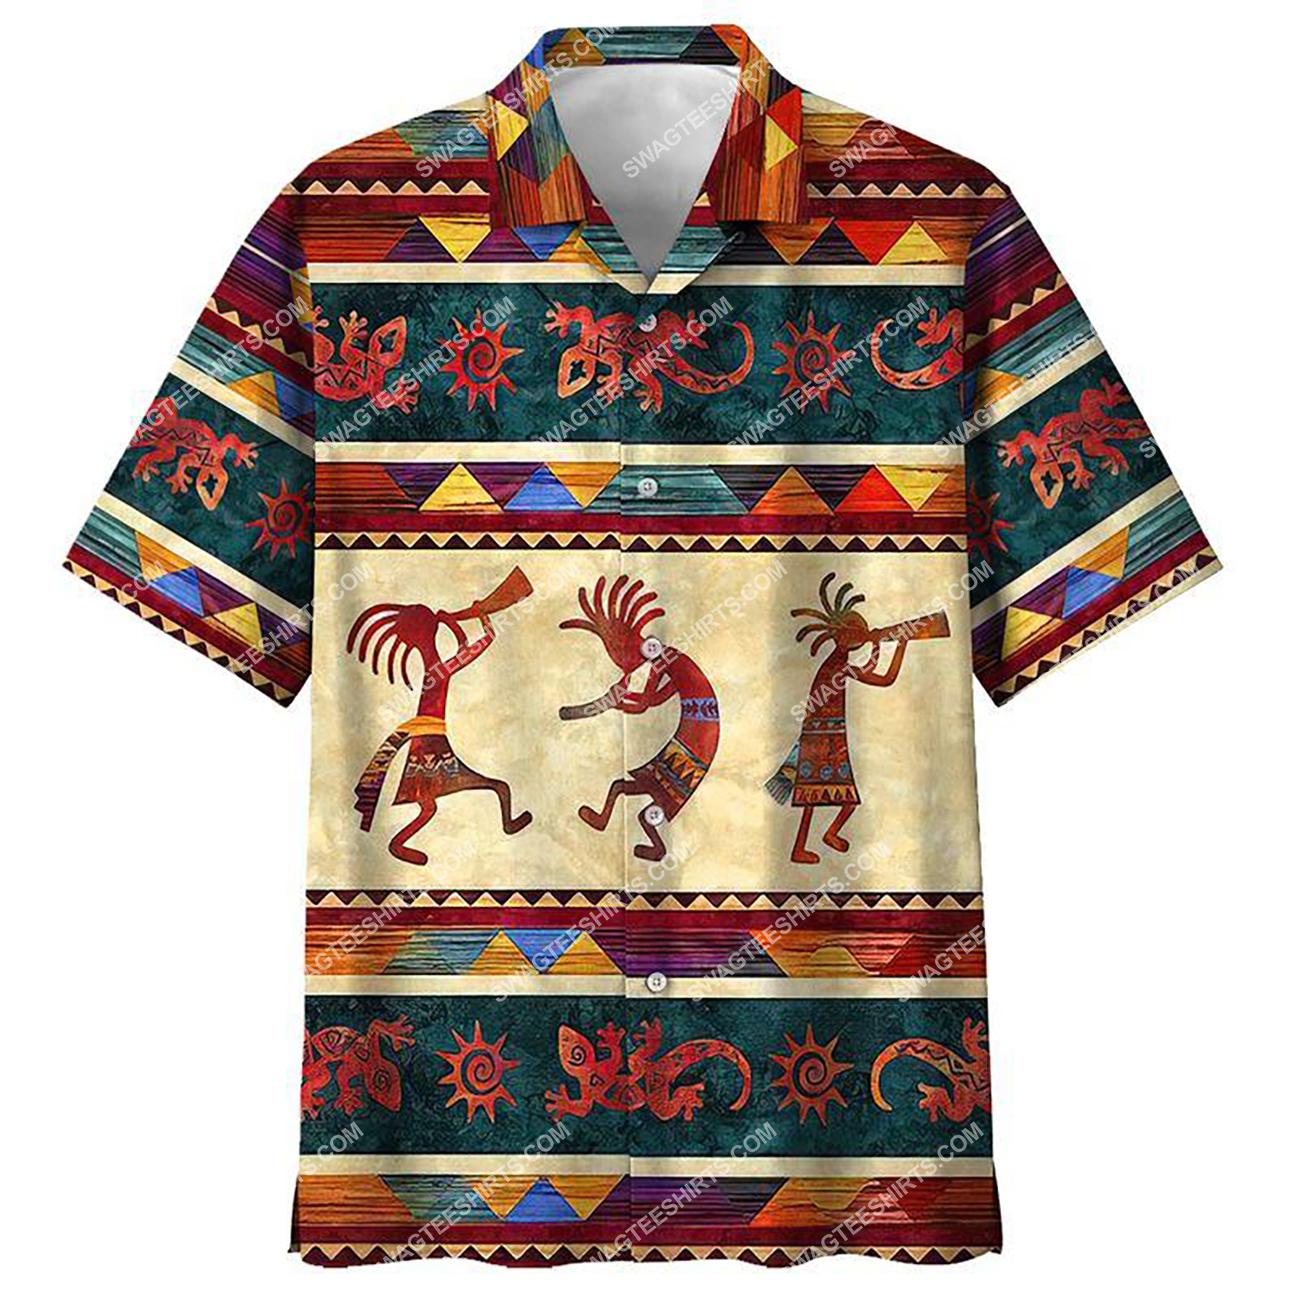 vintage native american culture all over printed hawaiian shirt 1(2) - Copy